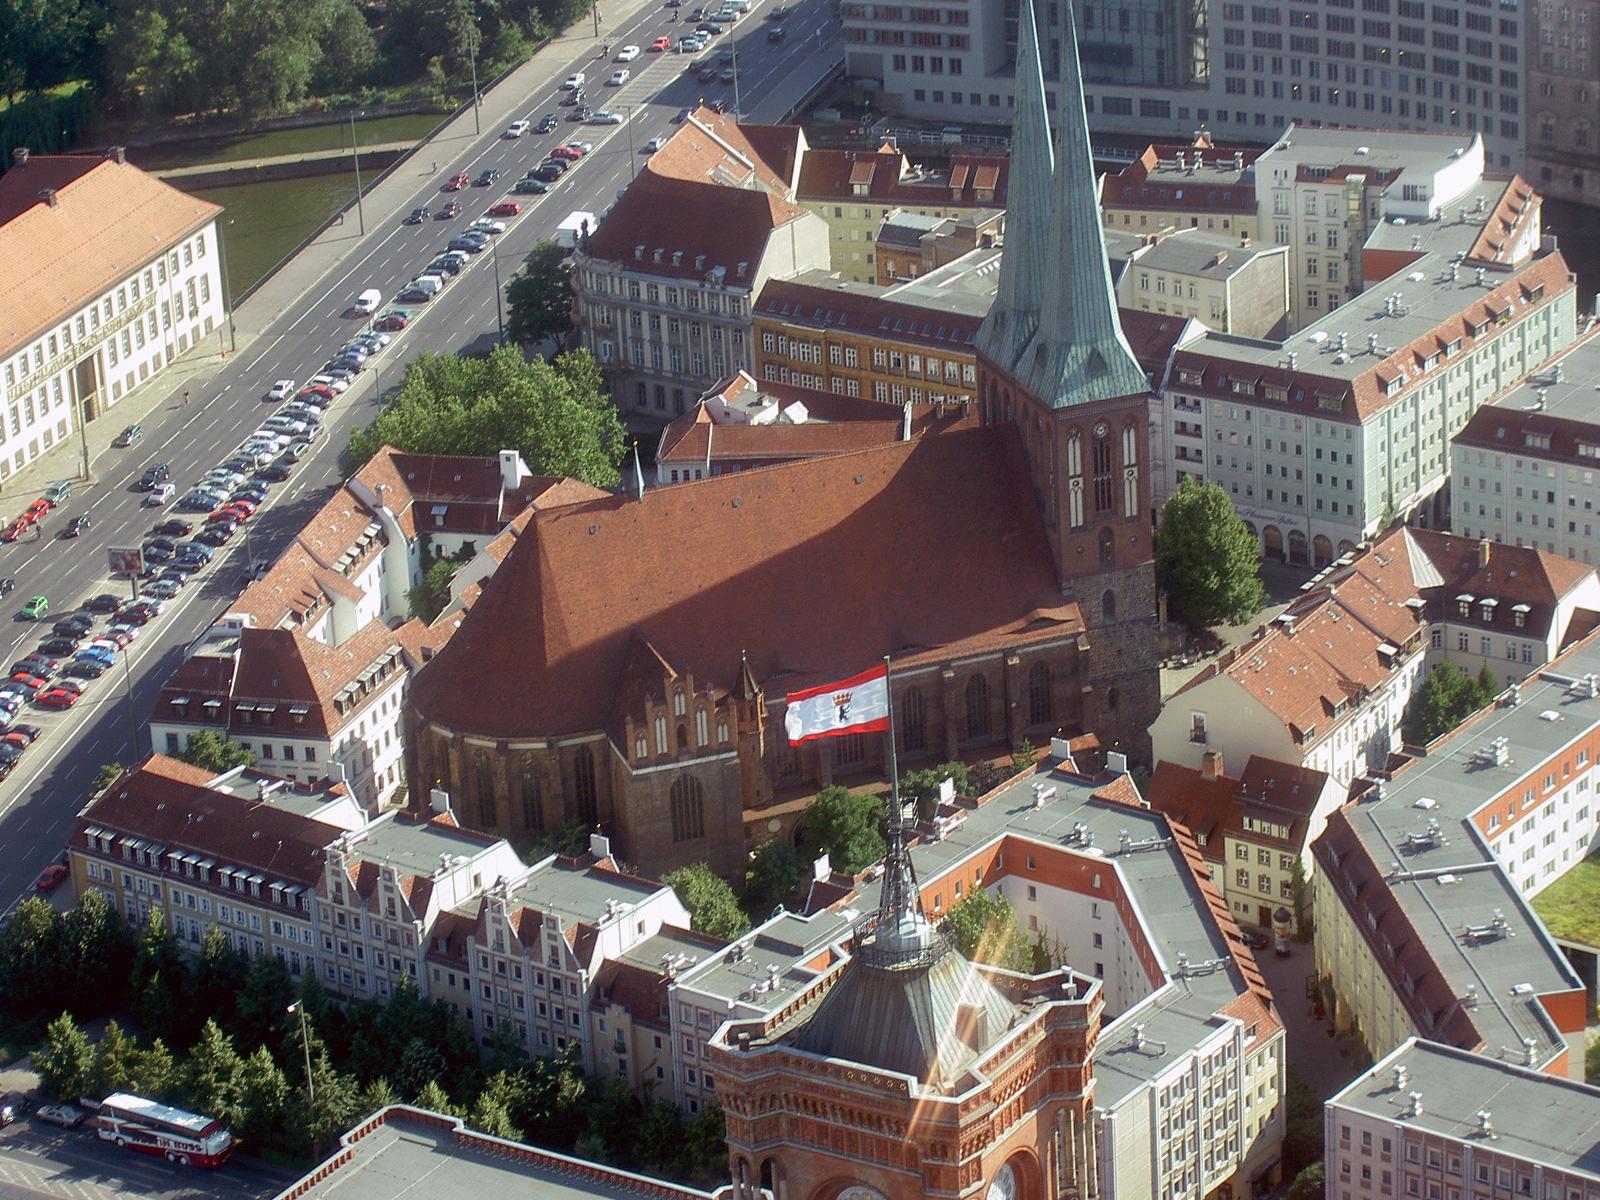 File:Nikolaikirche Berlin Fernsehturm.jpg